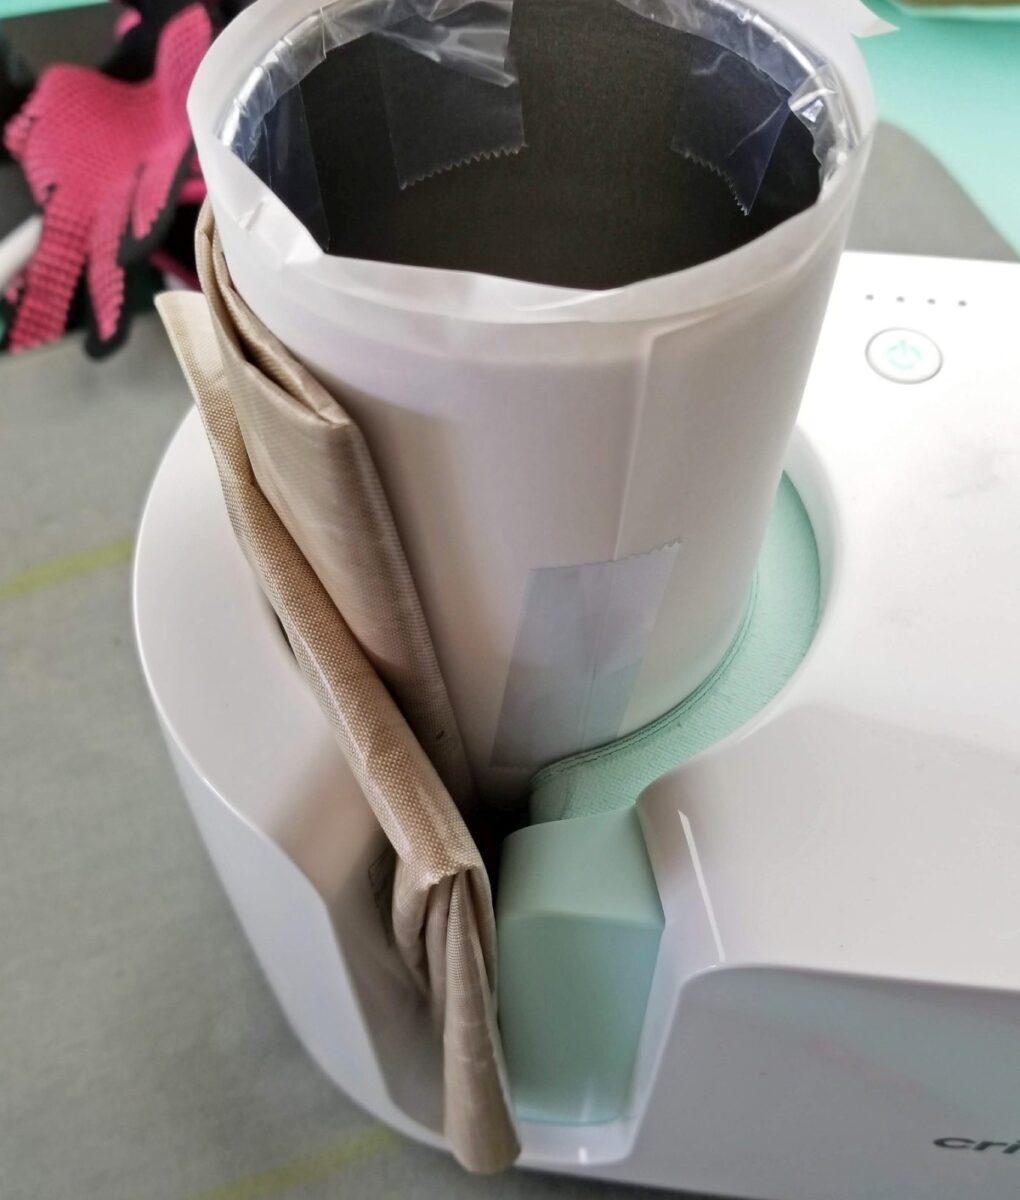 sublimation tumbler in mug press